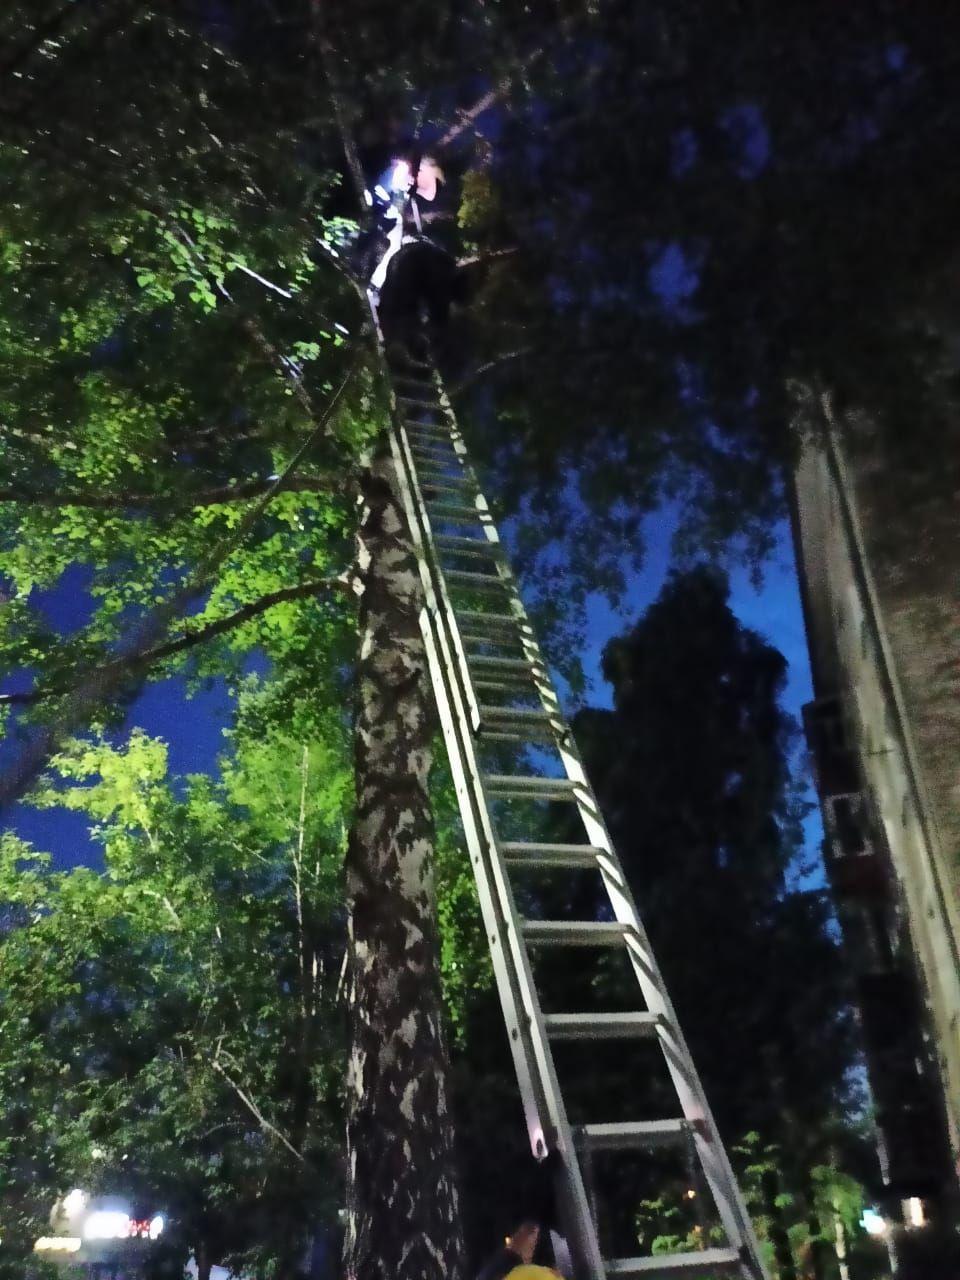 В Татарстане спасатели сняли с высокого дерева мужчину